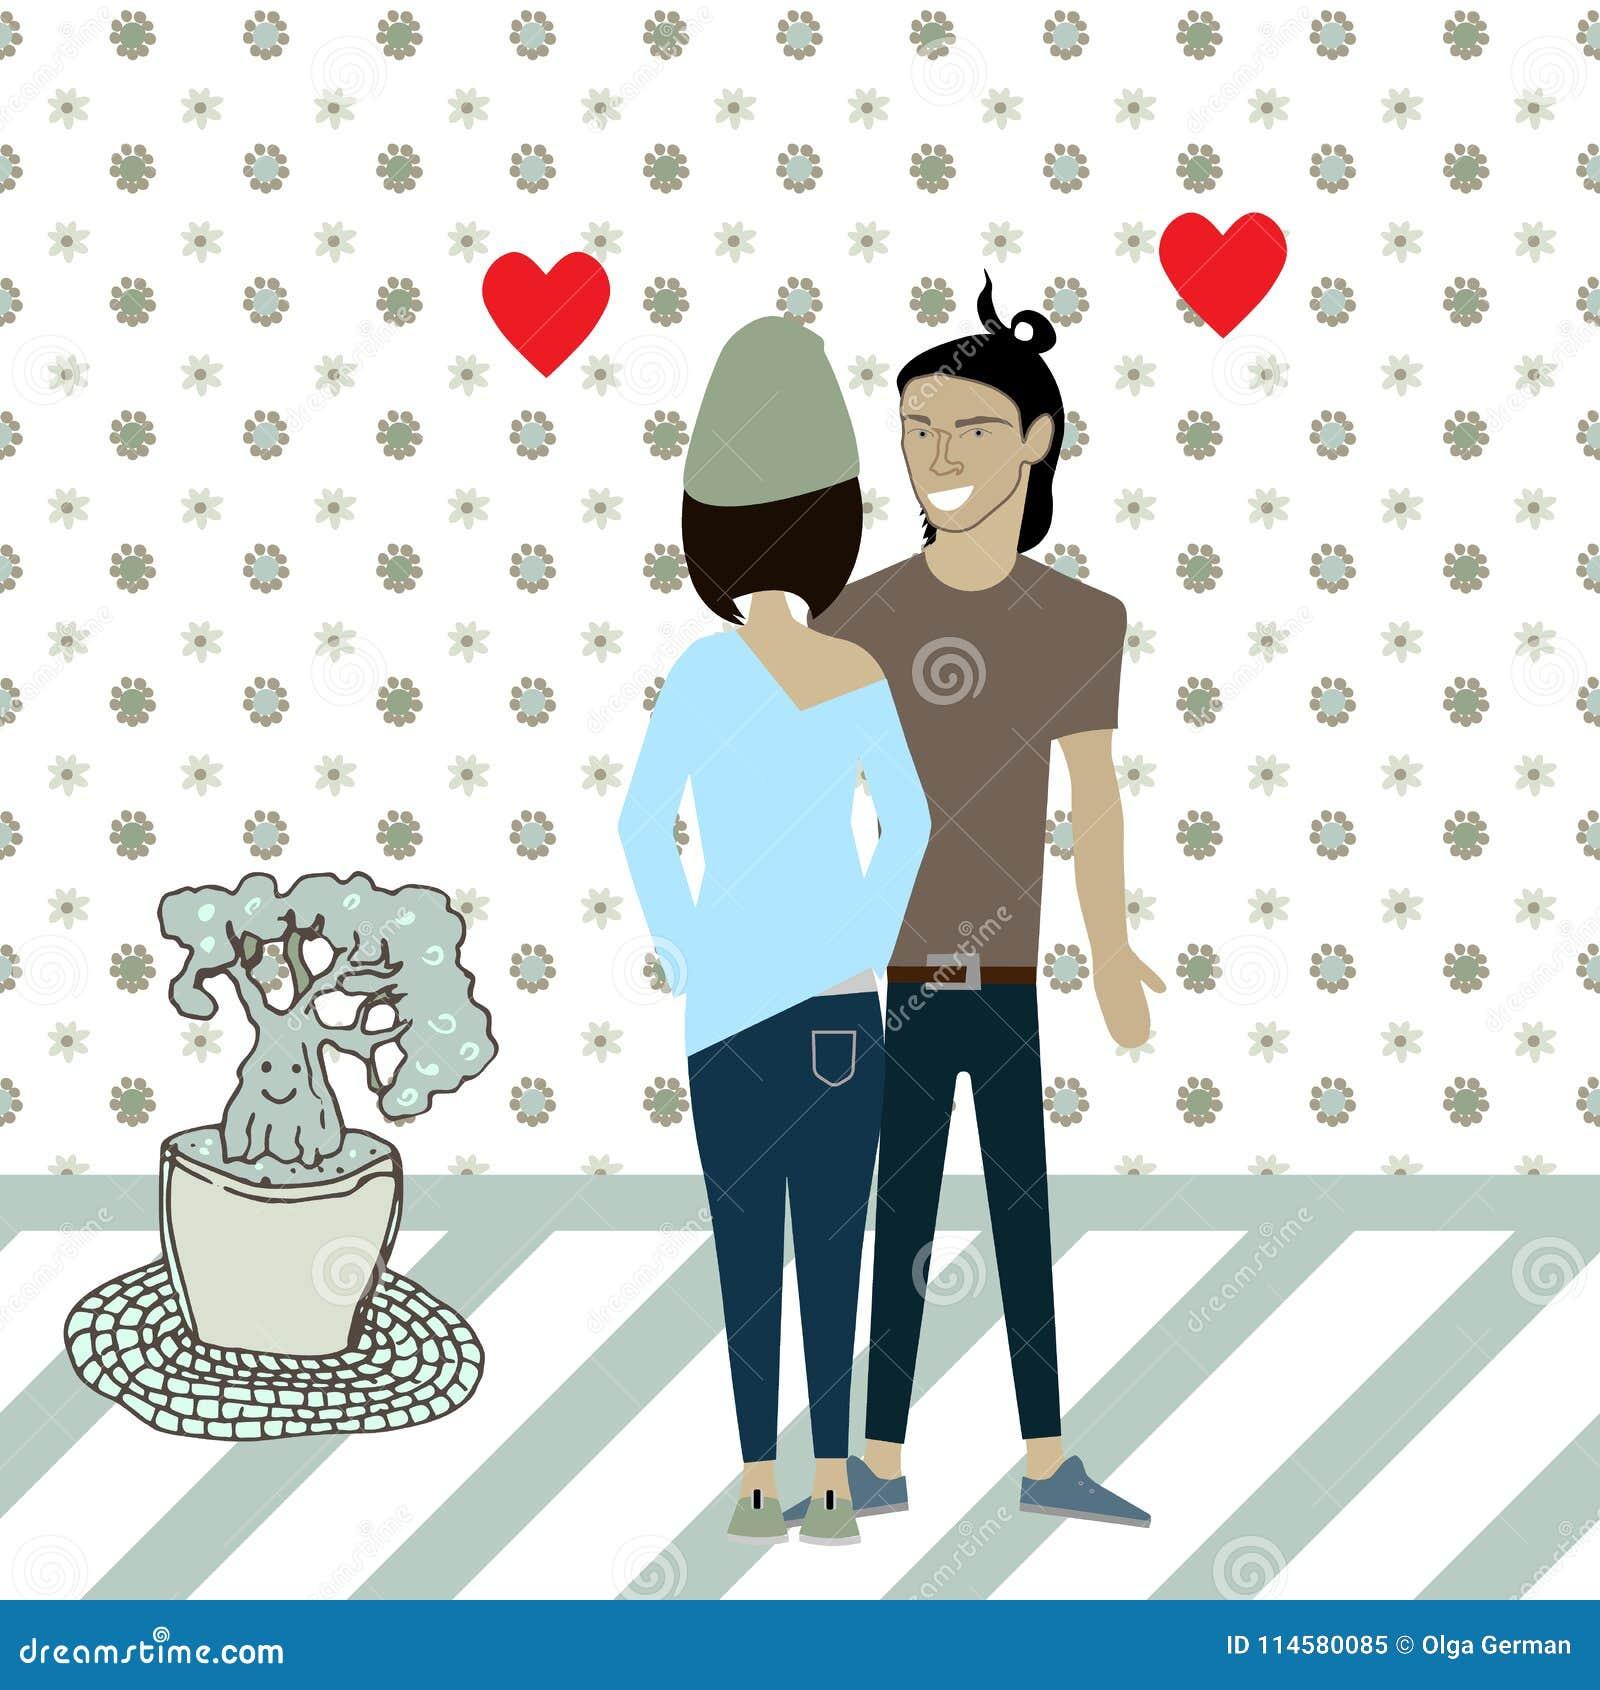 join. agree with wo fängt flirten an directly. interesting